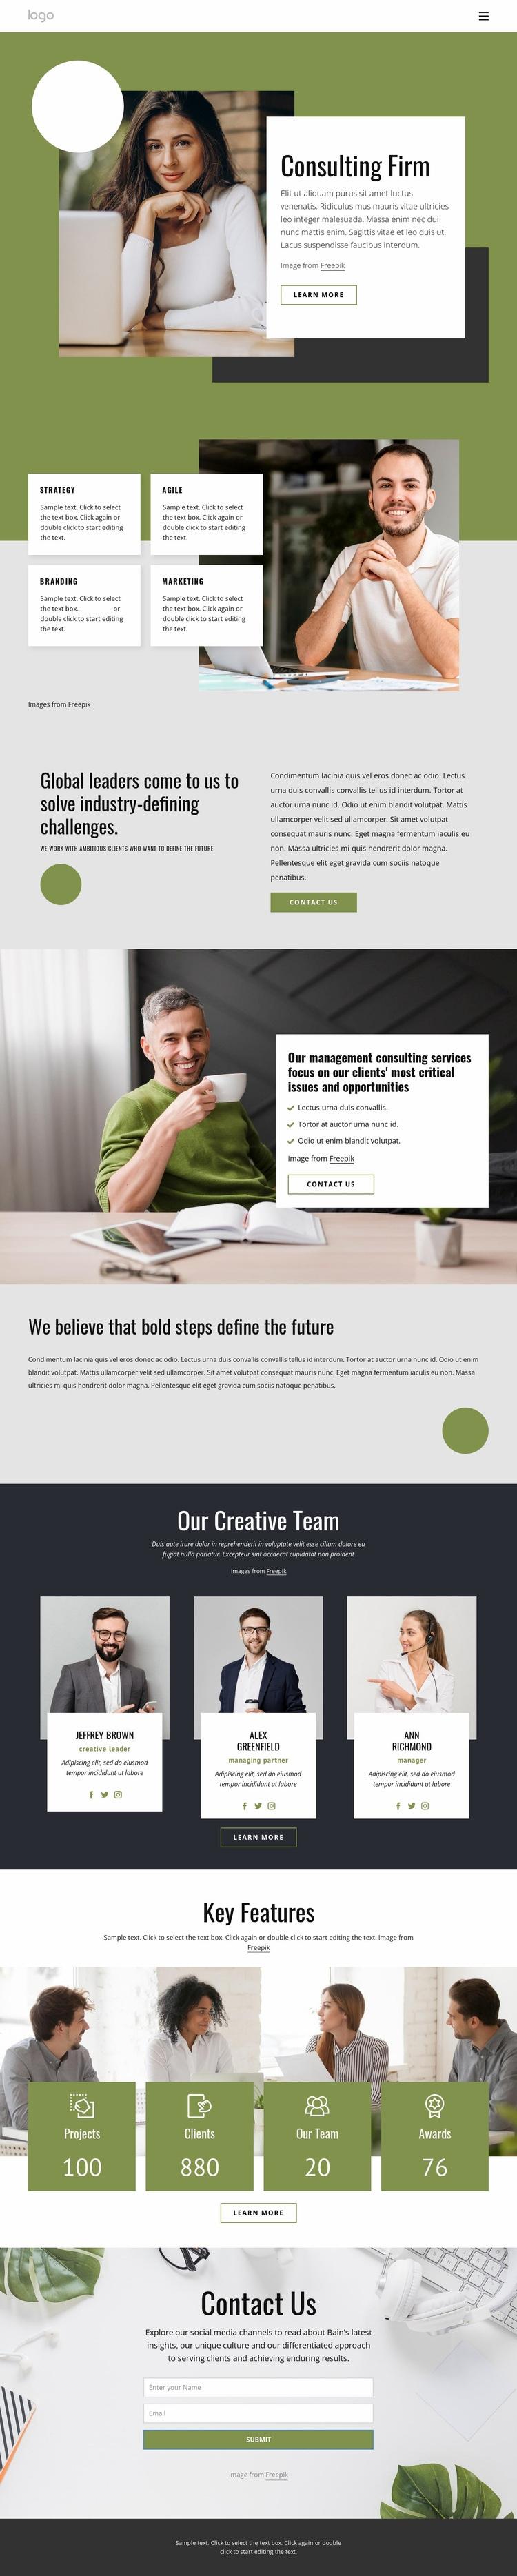 Start innovating Web Page Design